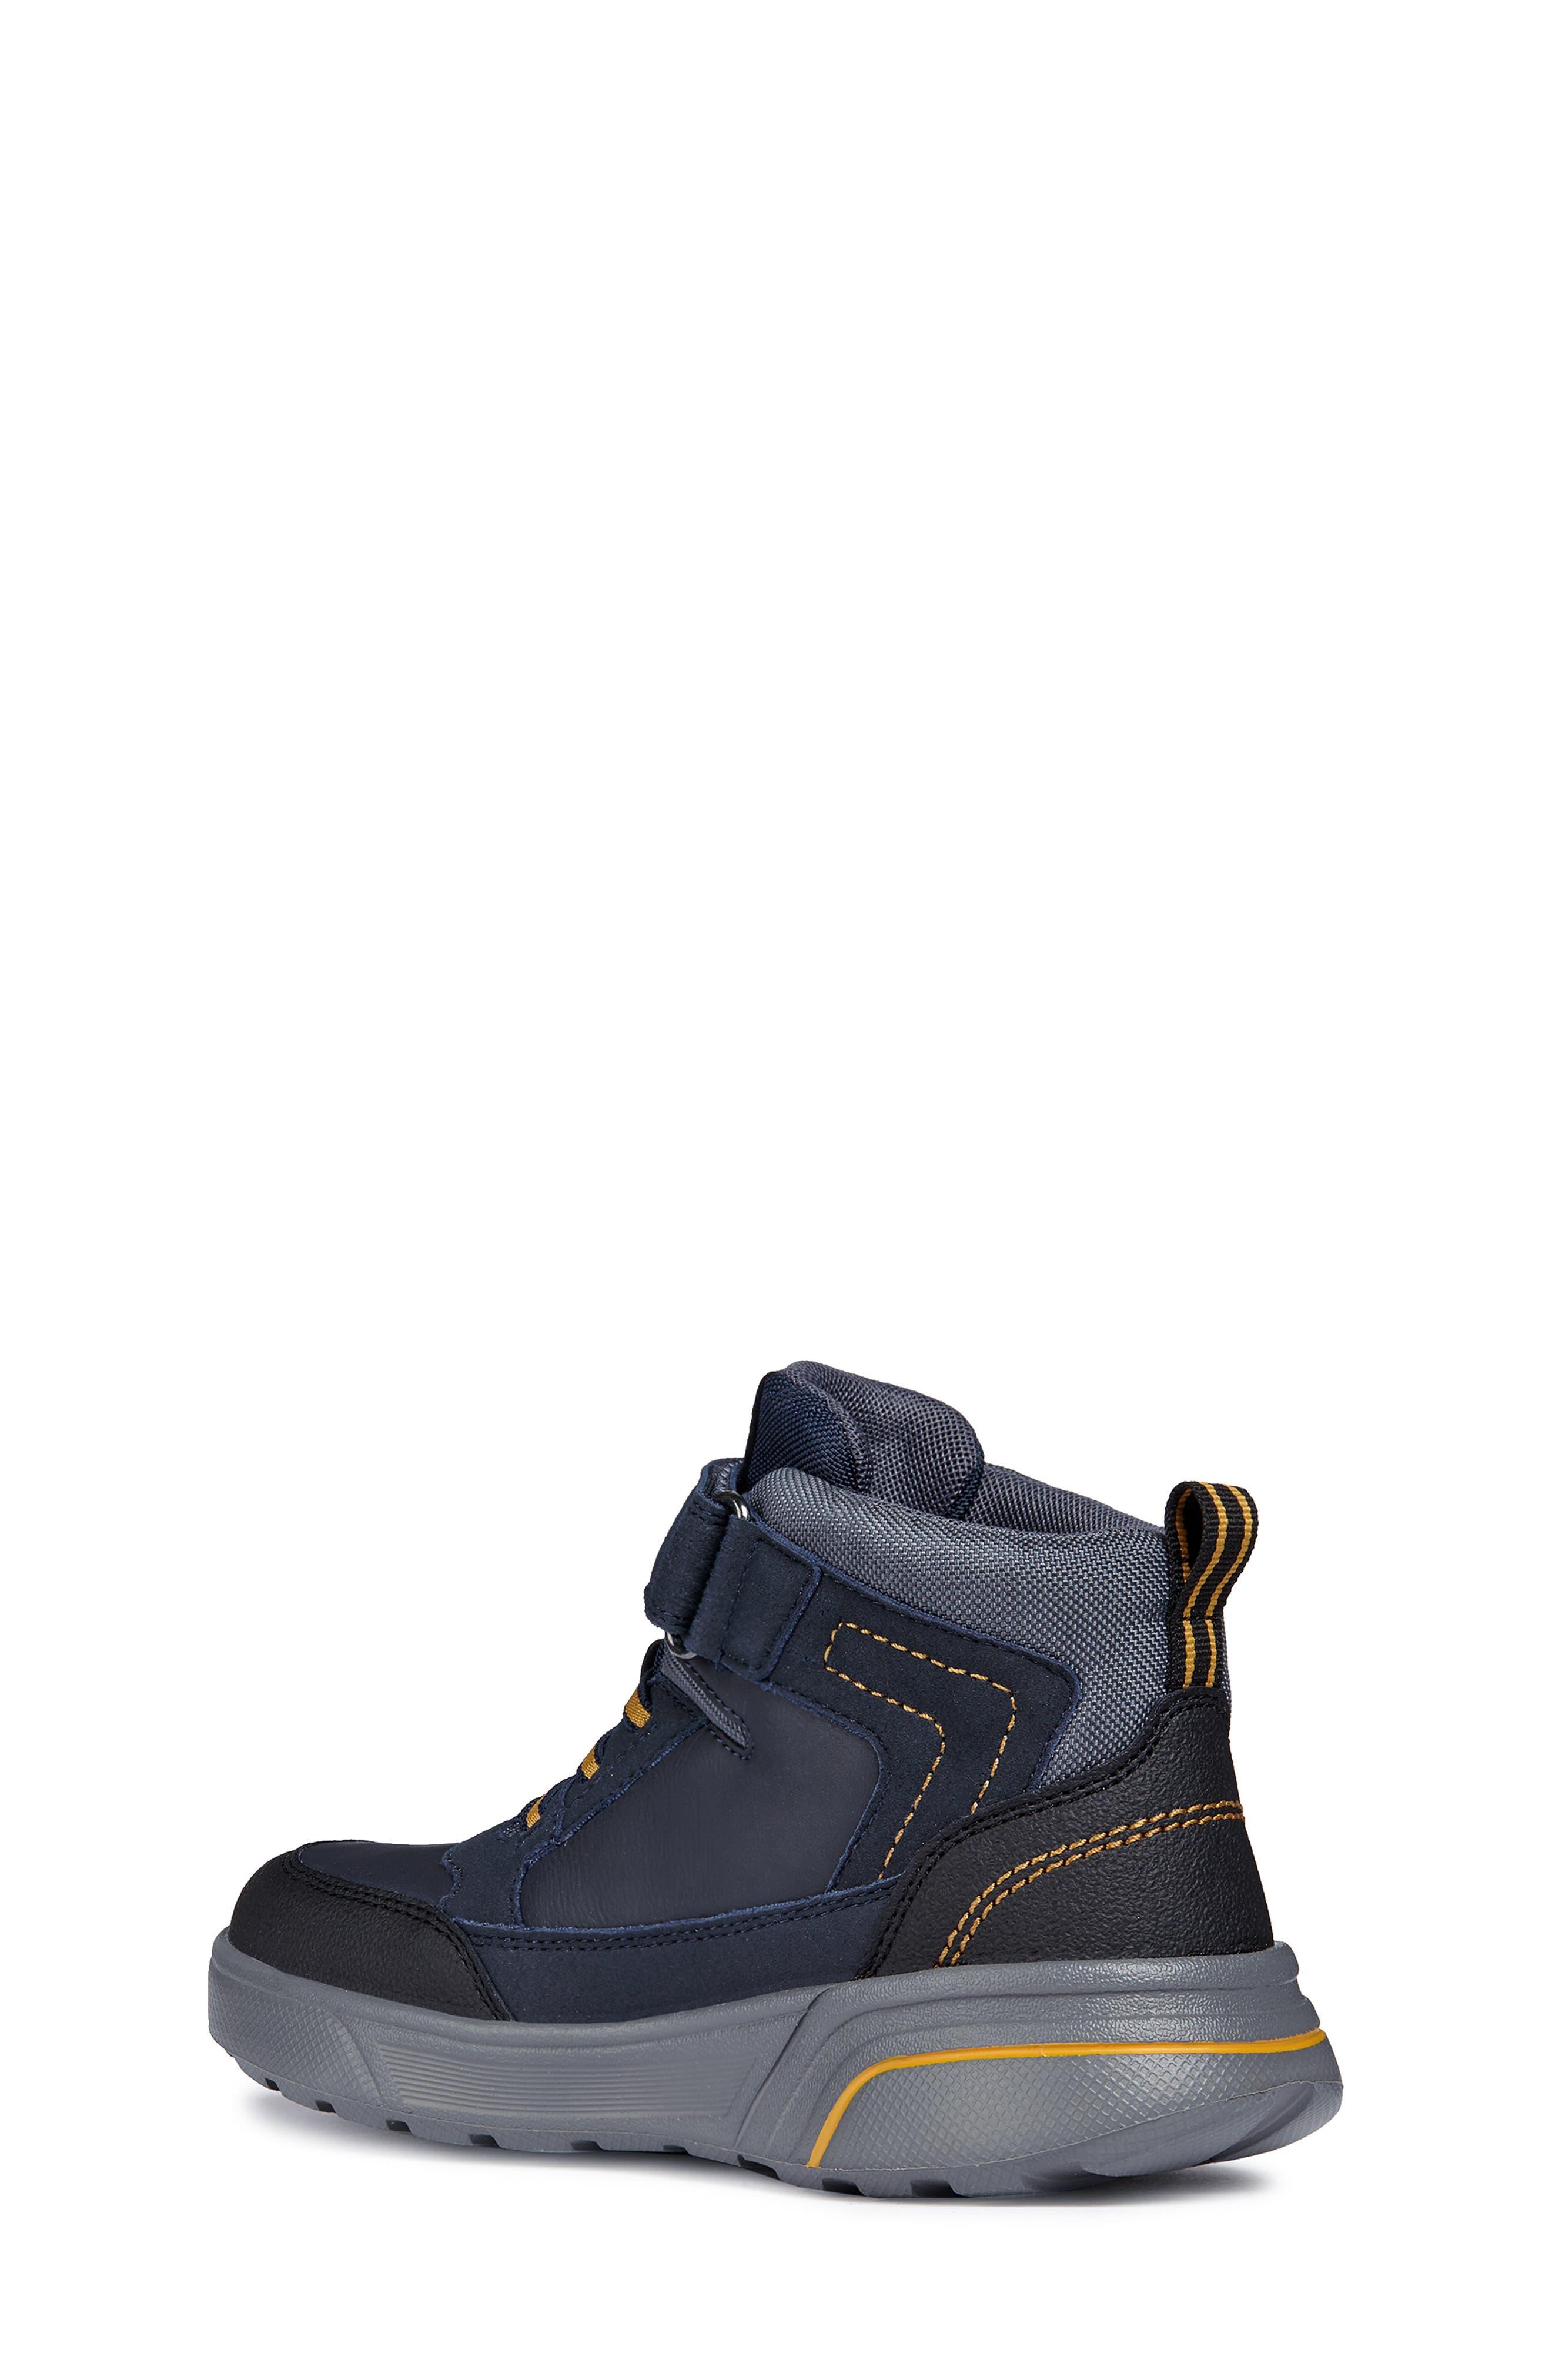 Sveggen ABX Waterproof Sneaker,                             Alternate thumbnail 2, color,                             NAVY/YELLOW